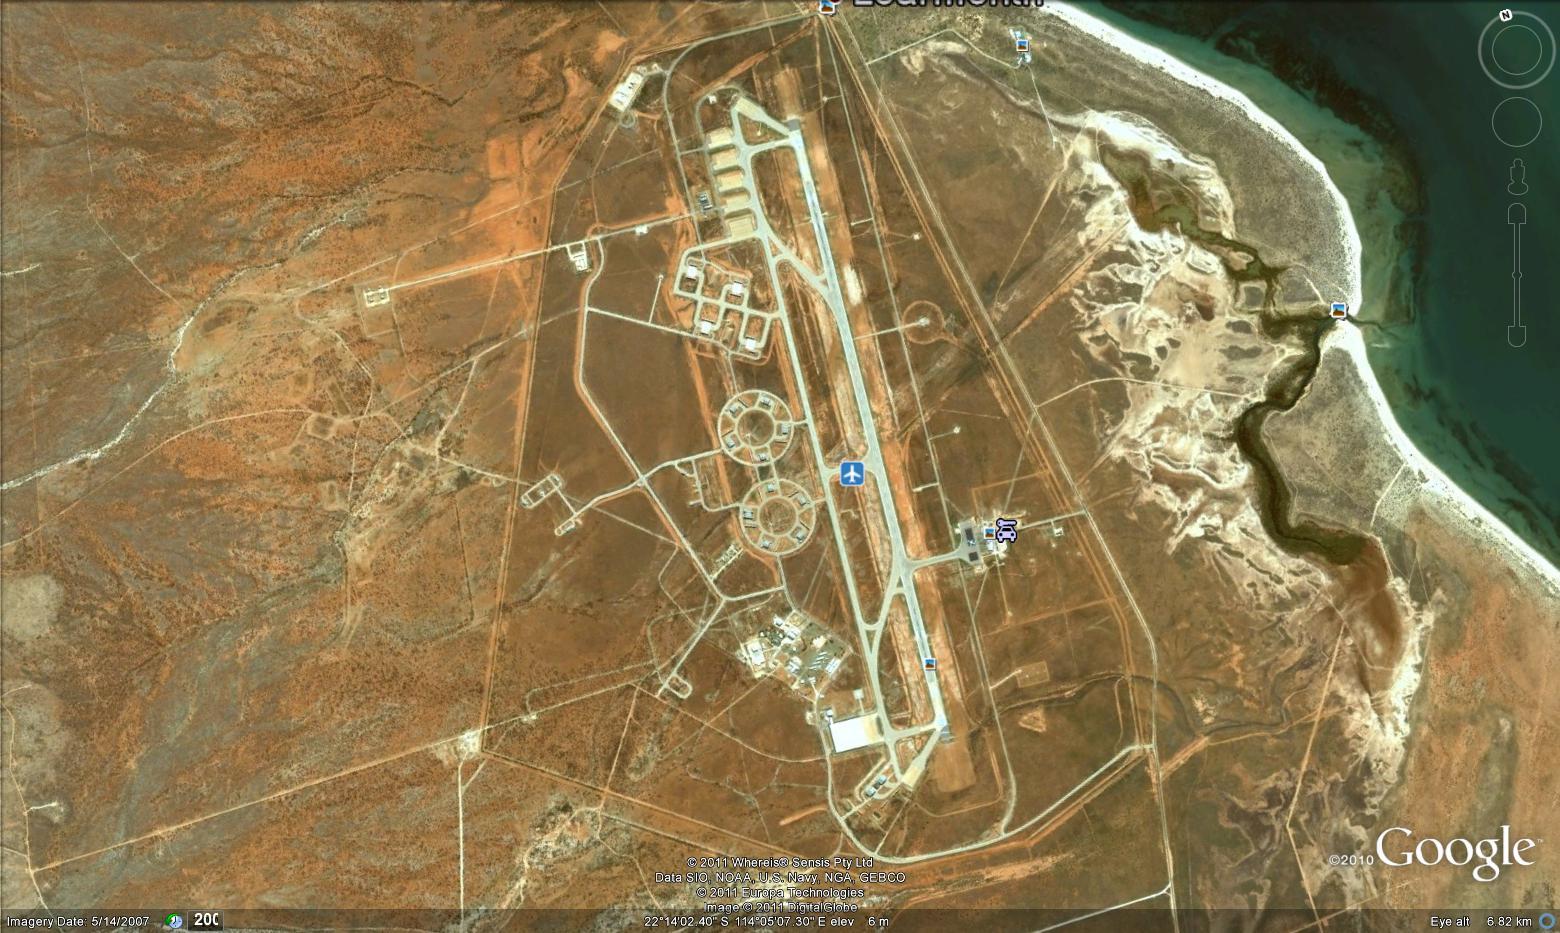 Airport south of HARRP Australia